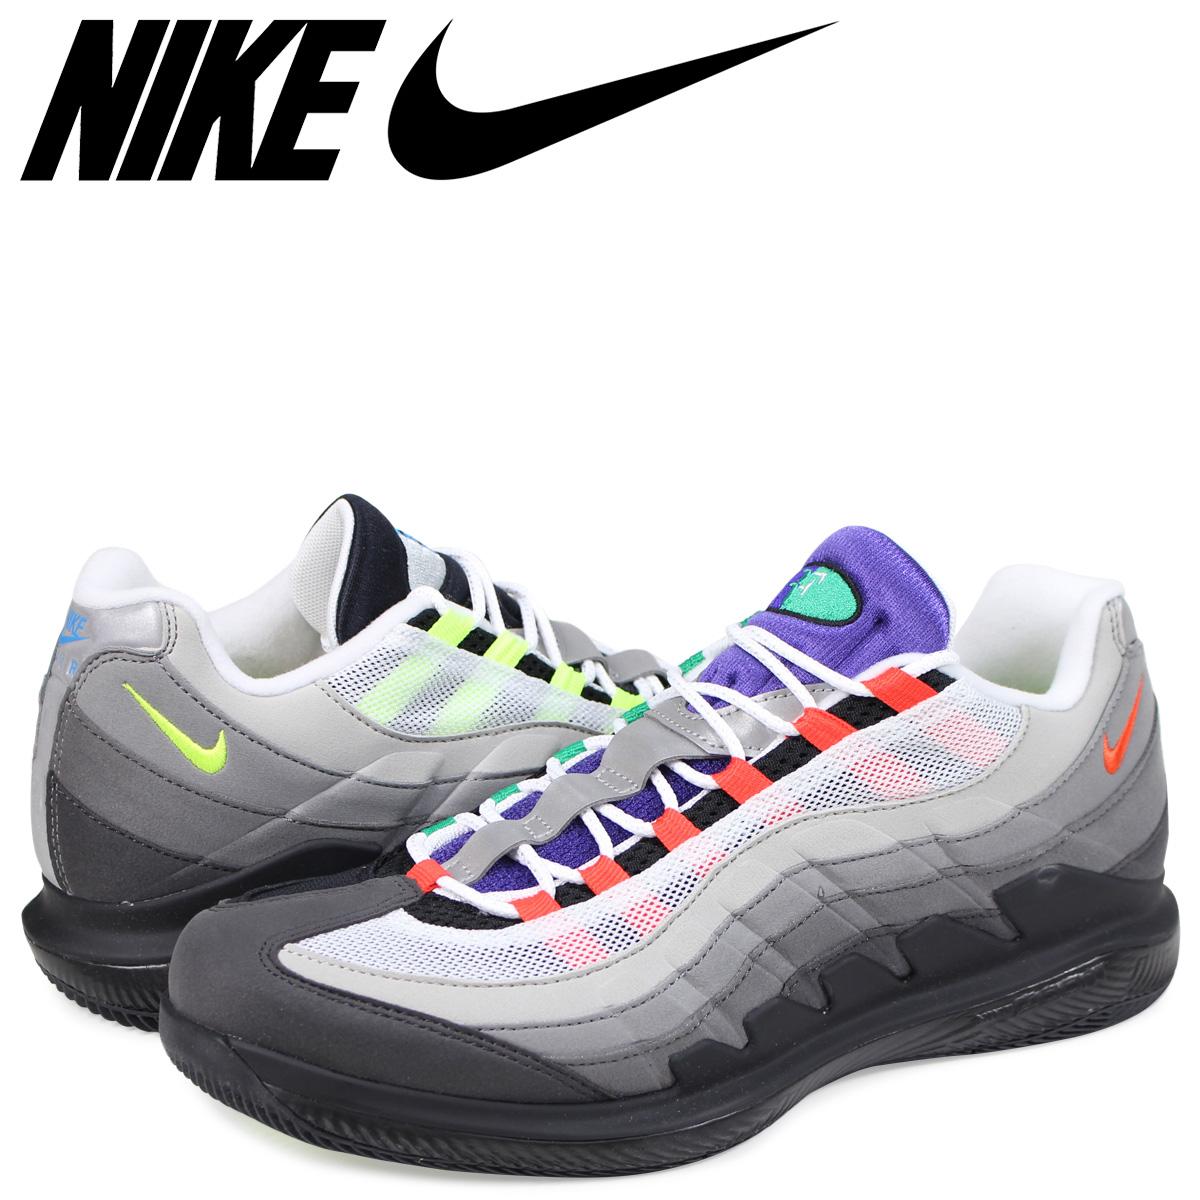 4173102a0087f ALLSPORTS  NIKE COURT VAPOR RF X AM95 VOLT Nike coat vapor sneakers ...